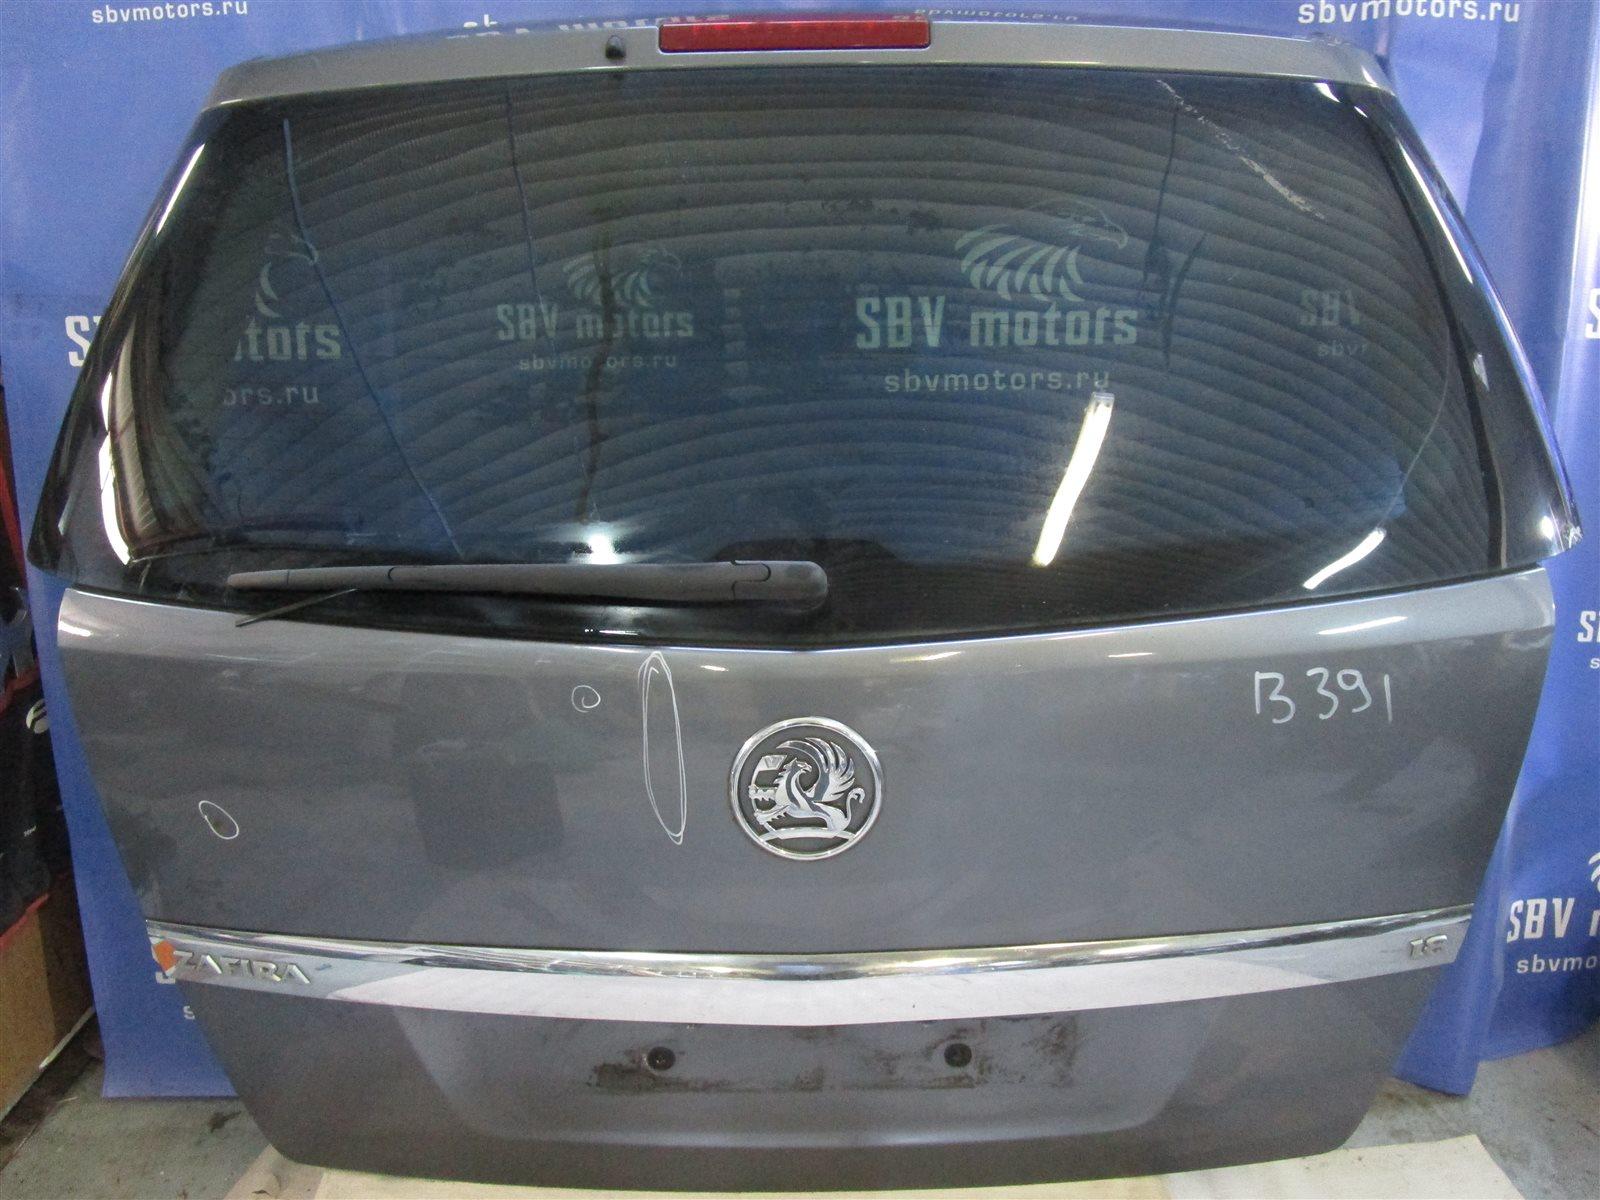 Крышка багажника Opel Zafira Z18XER 04.07.2007